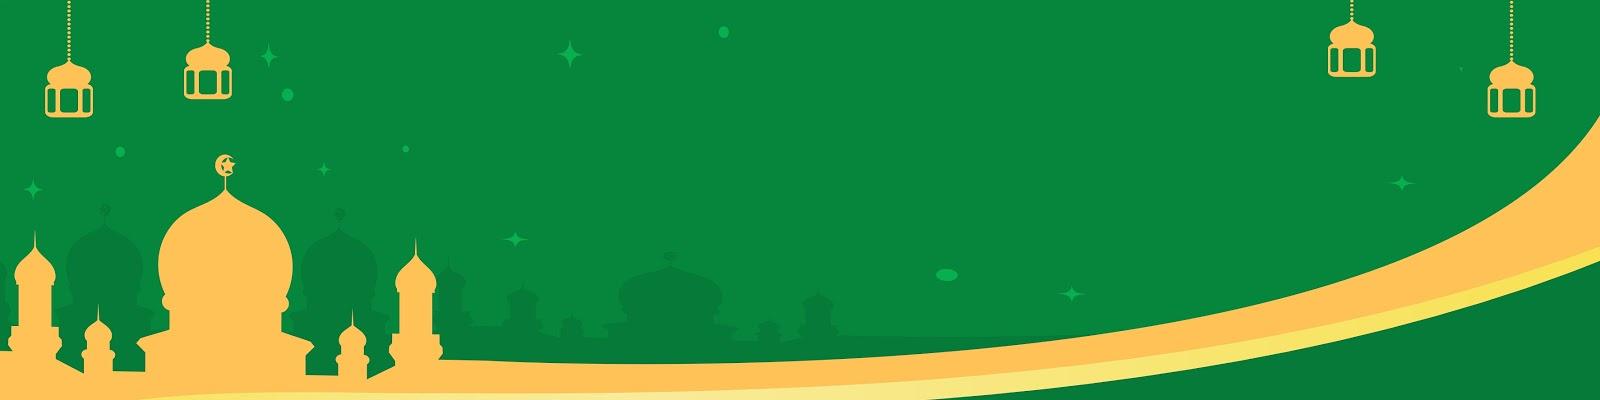 Unduh 640 Background Banner Lebaran Gratis Terbaik